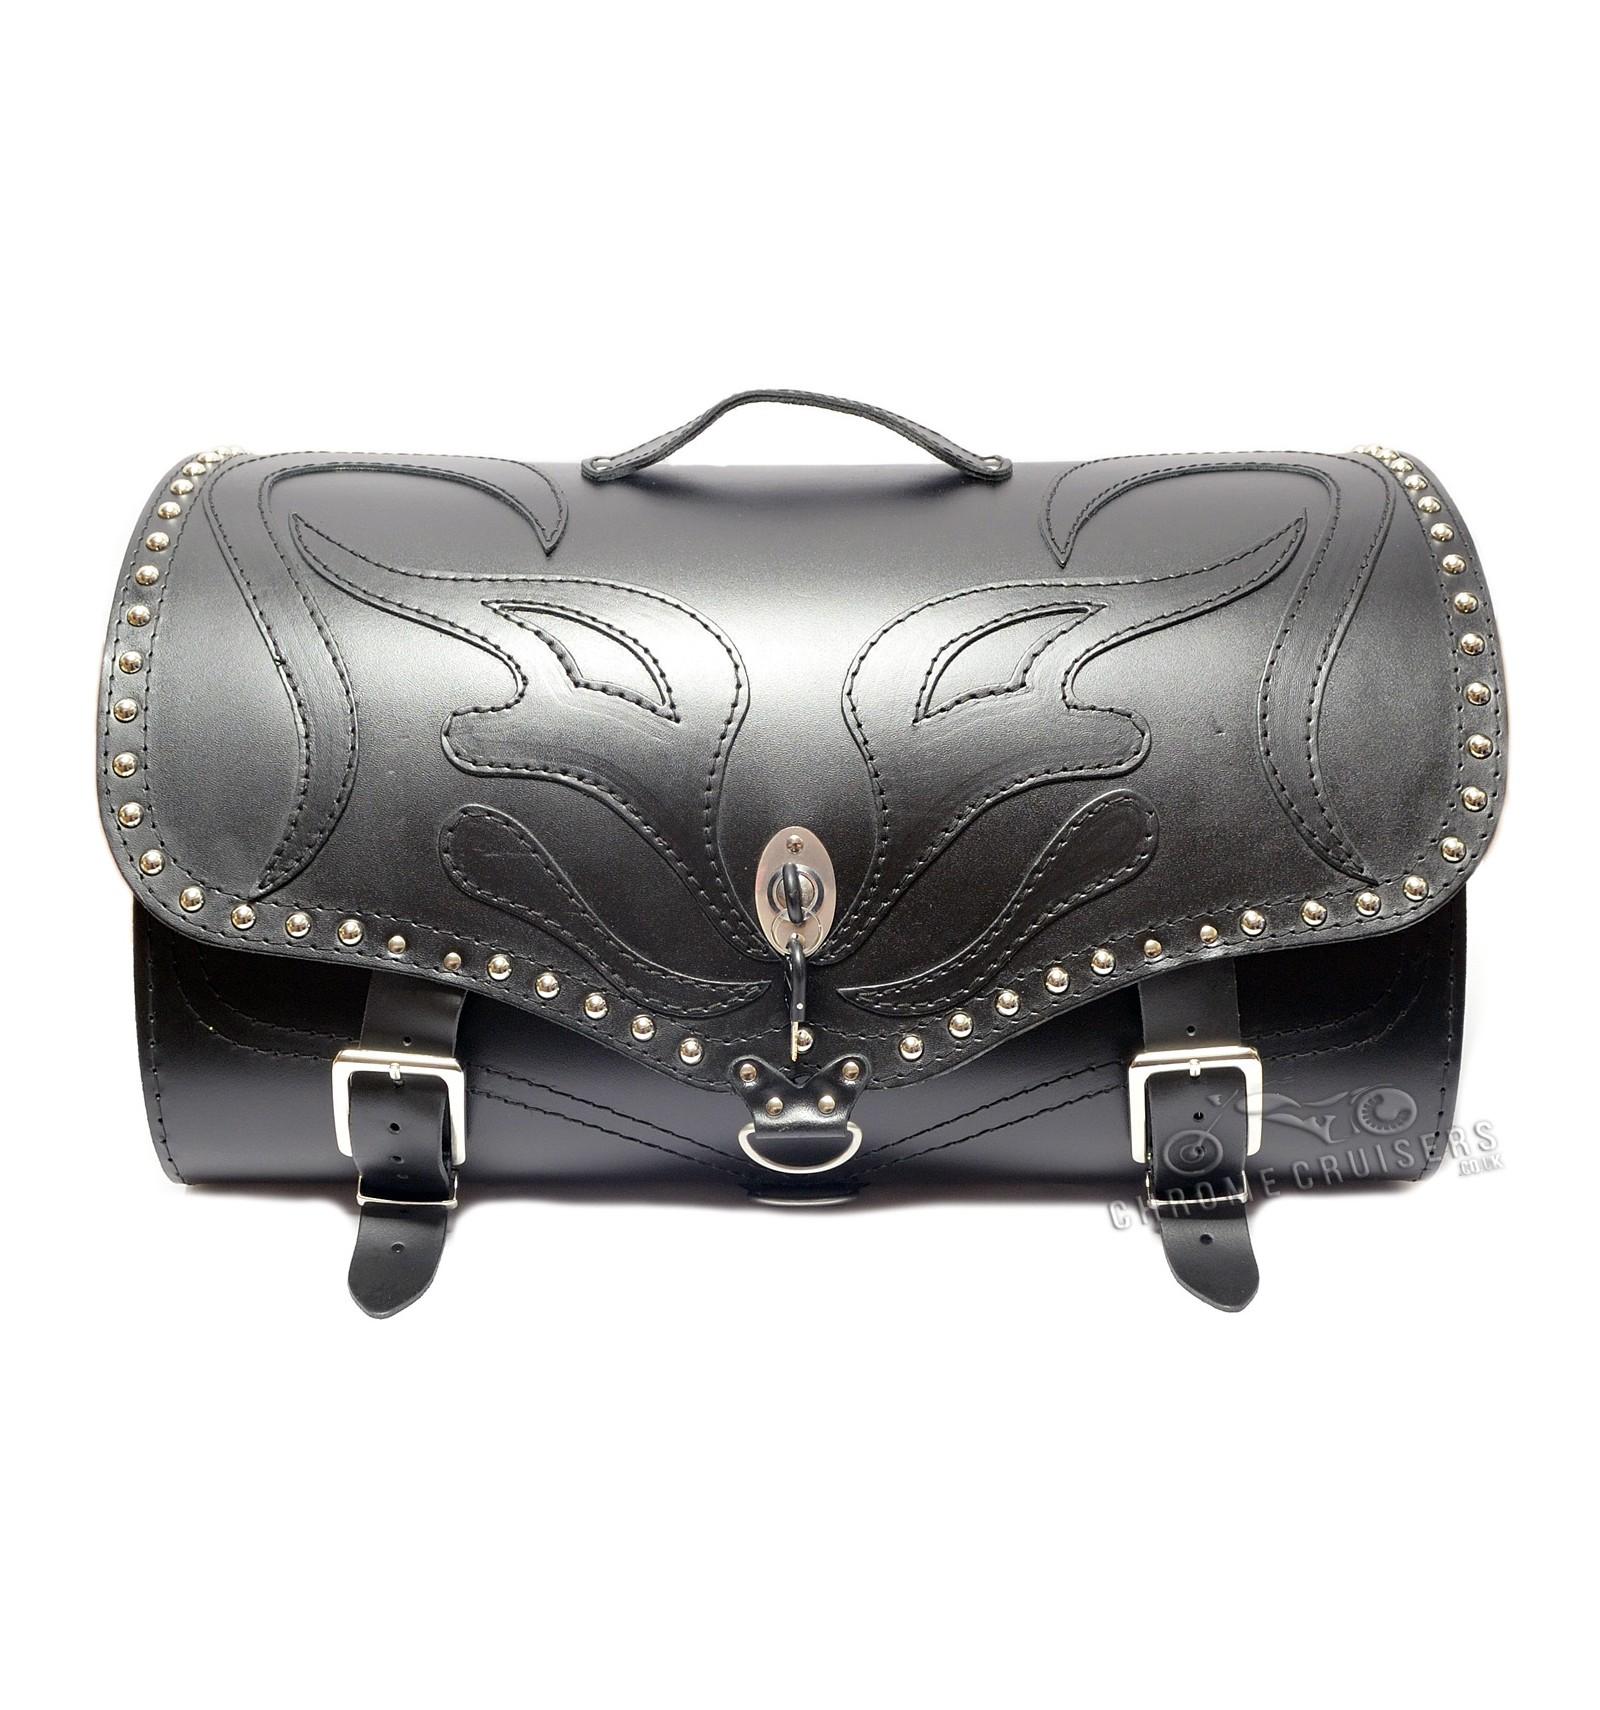 Motorcycle Leather Rear Bag Top Case Sissy Bar Bag